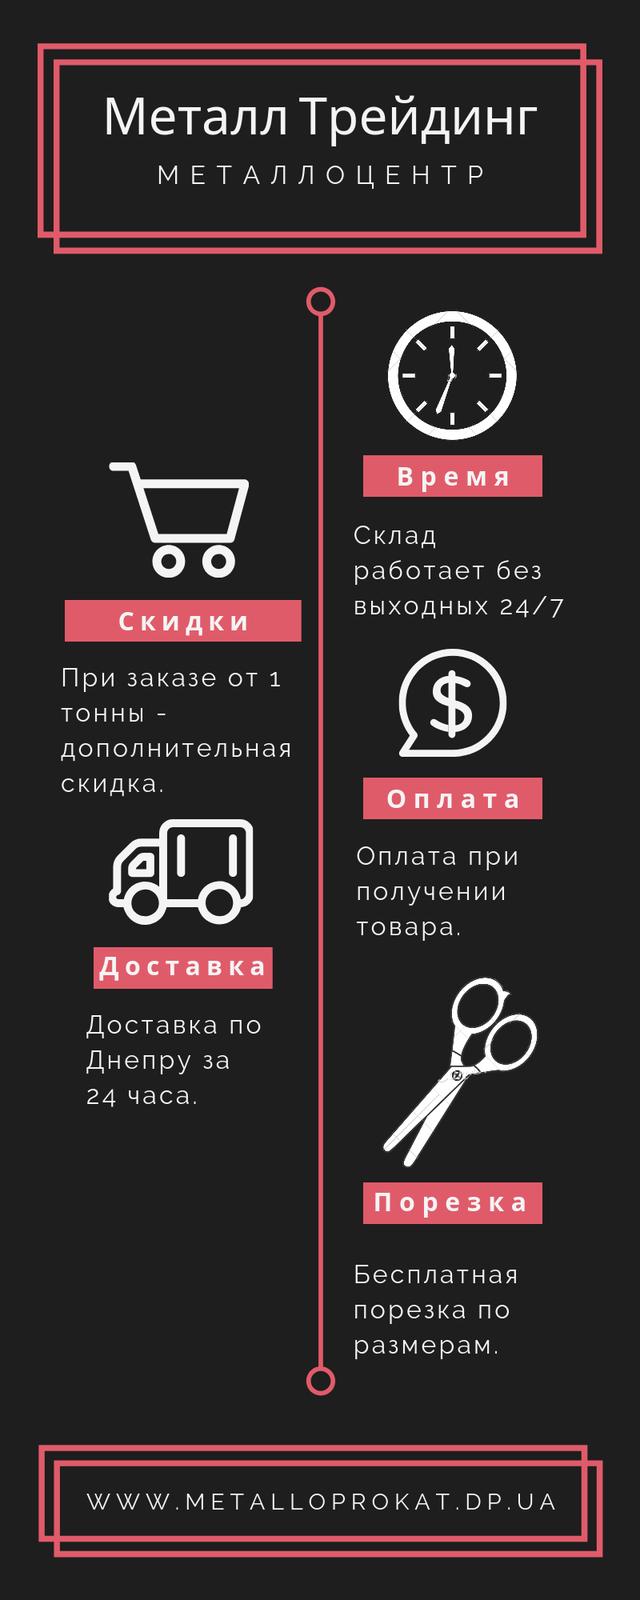 инфографика металлопрокат